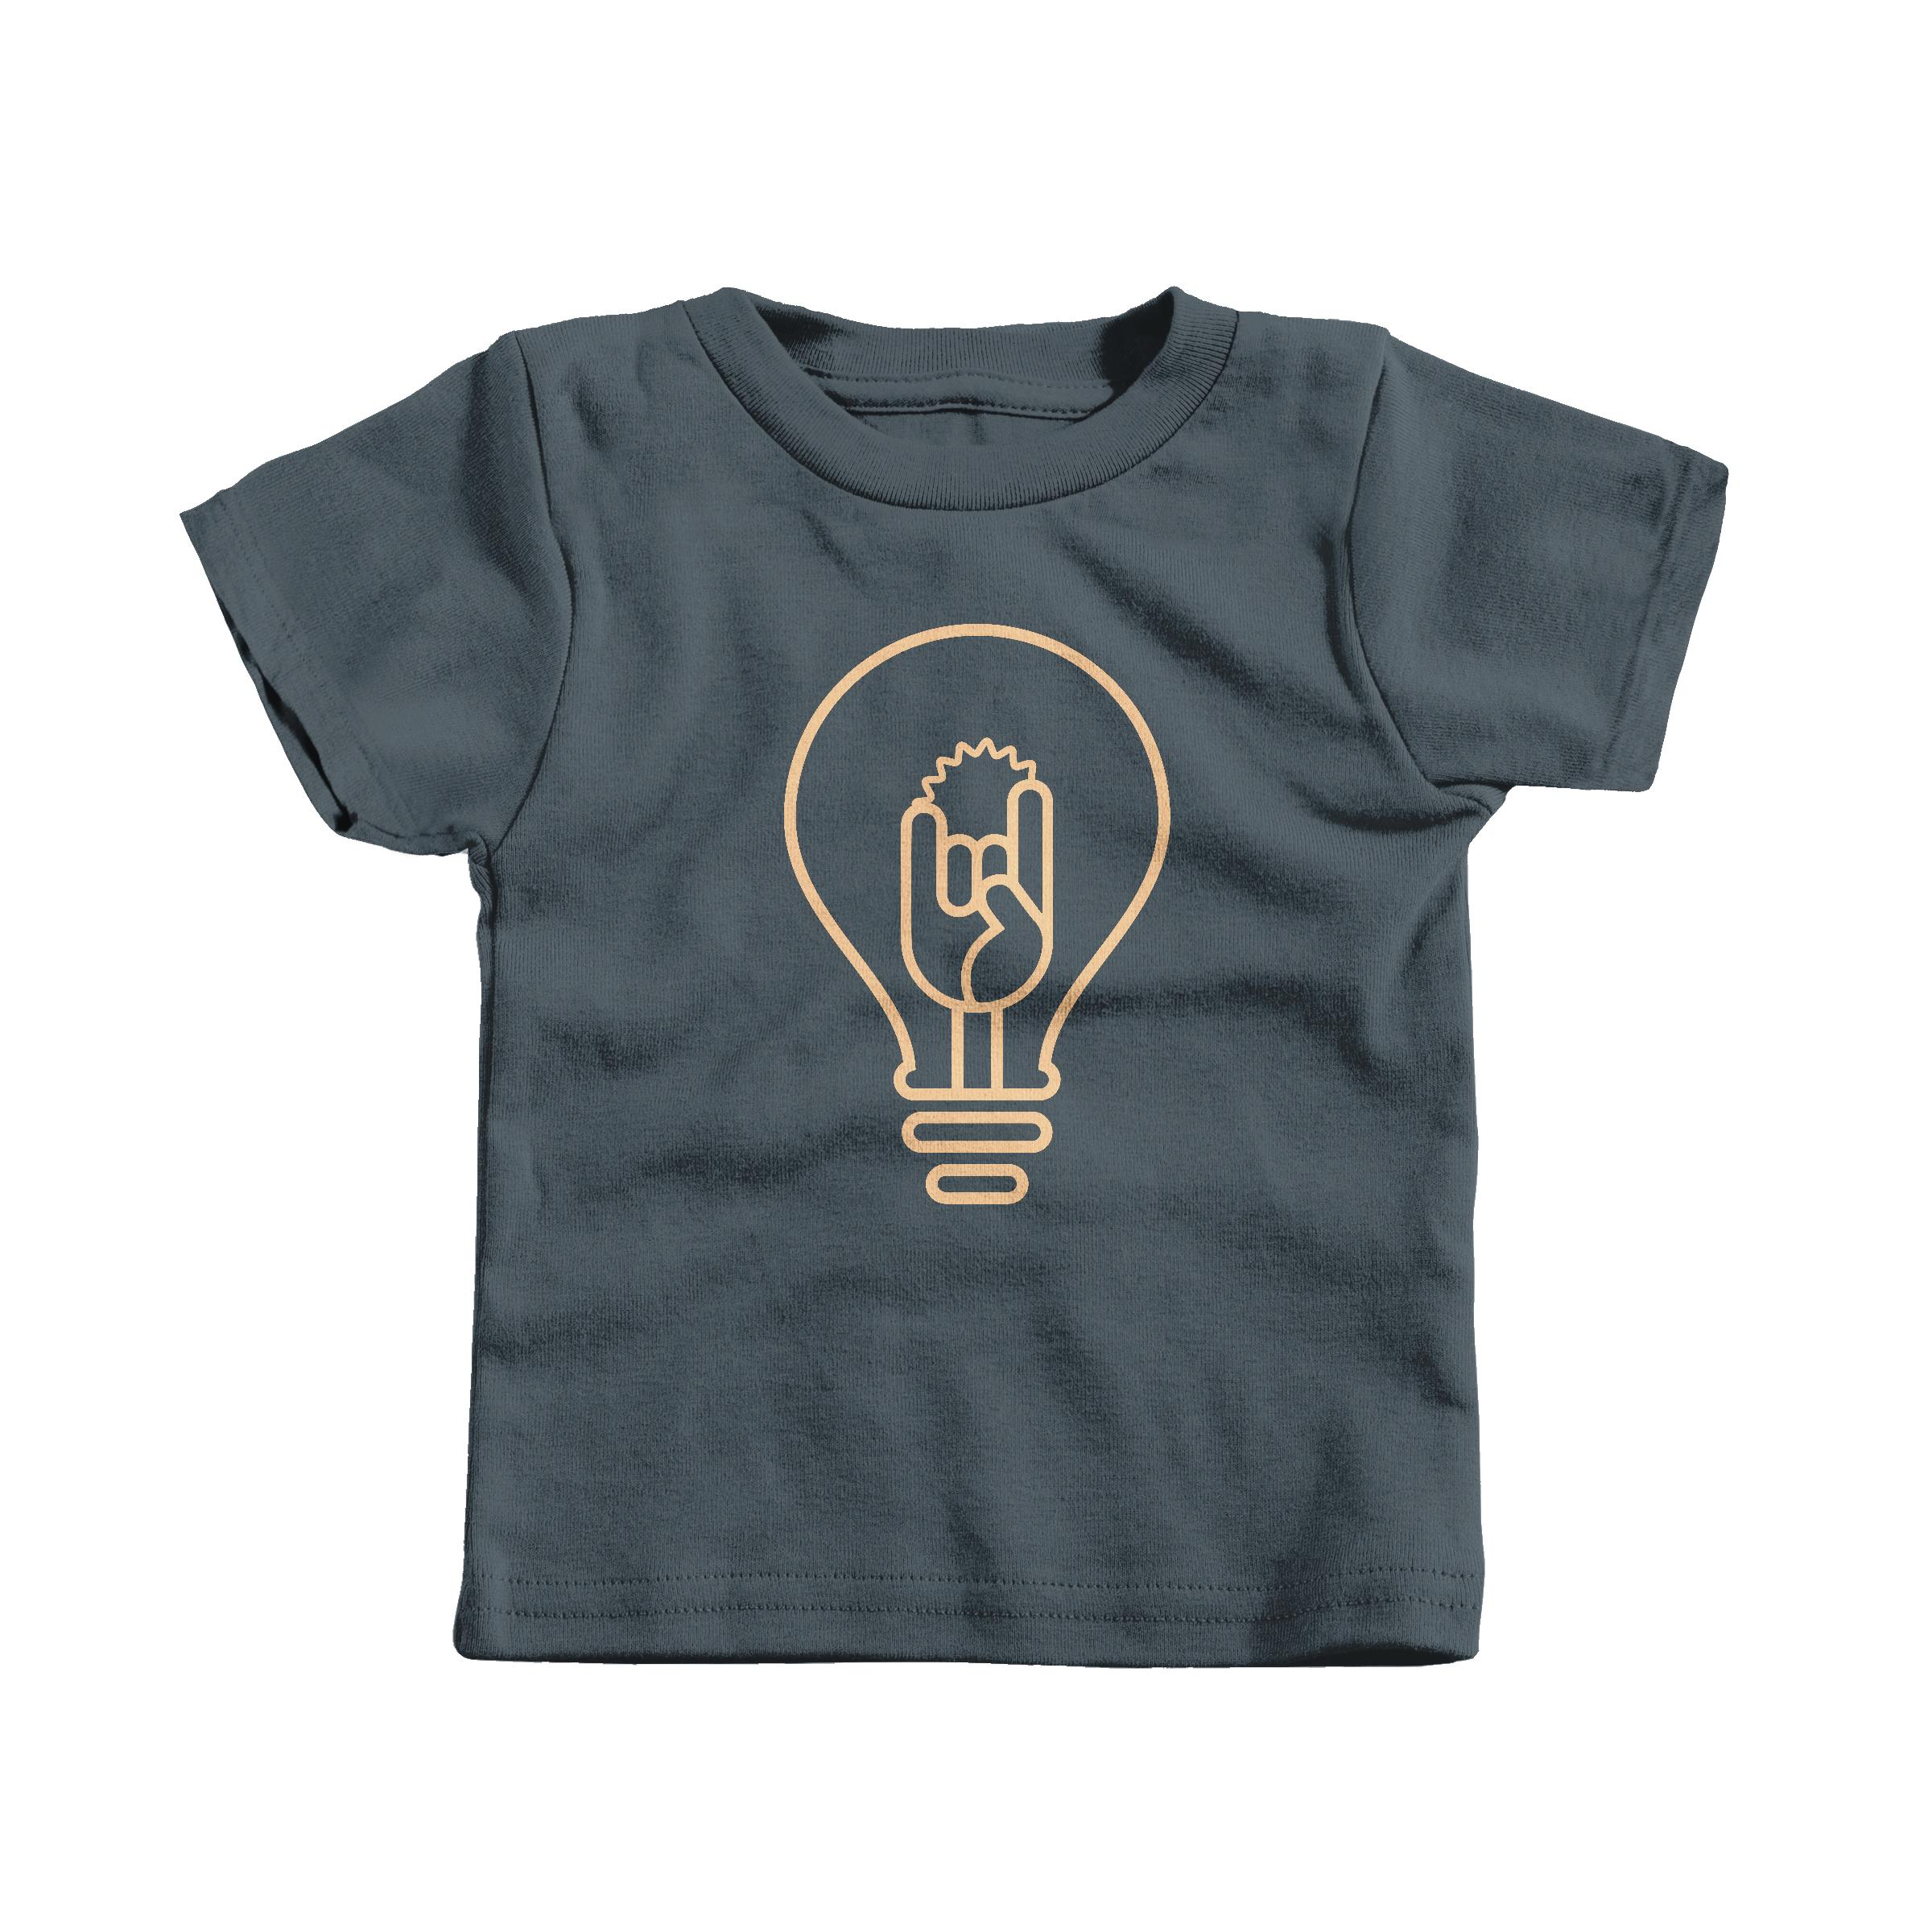 Idea Generator Charcoal (T-Shirt)